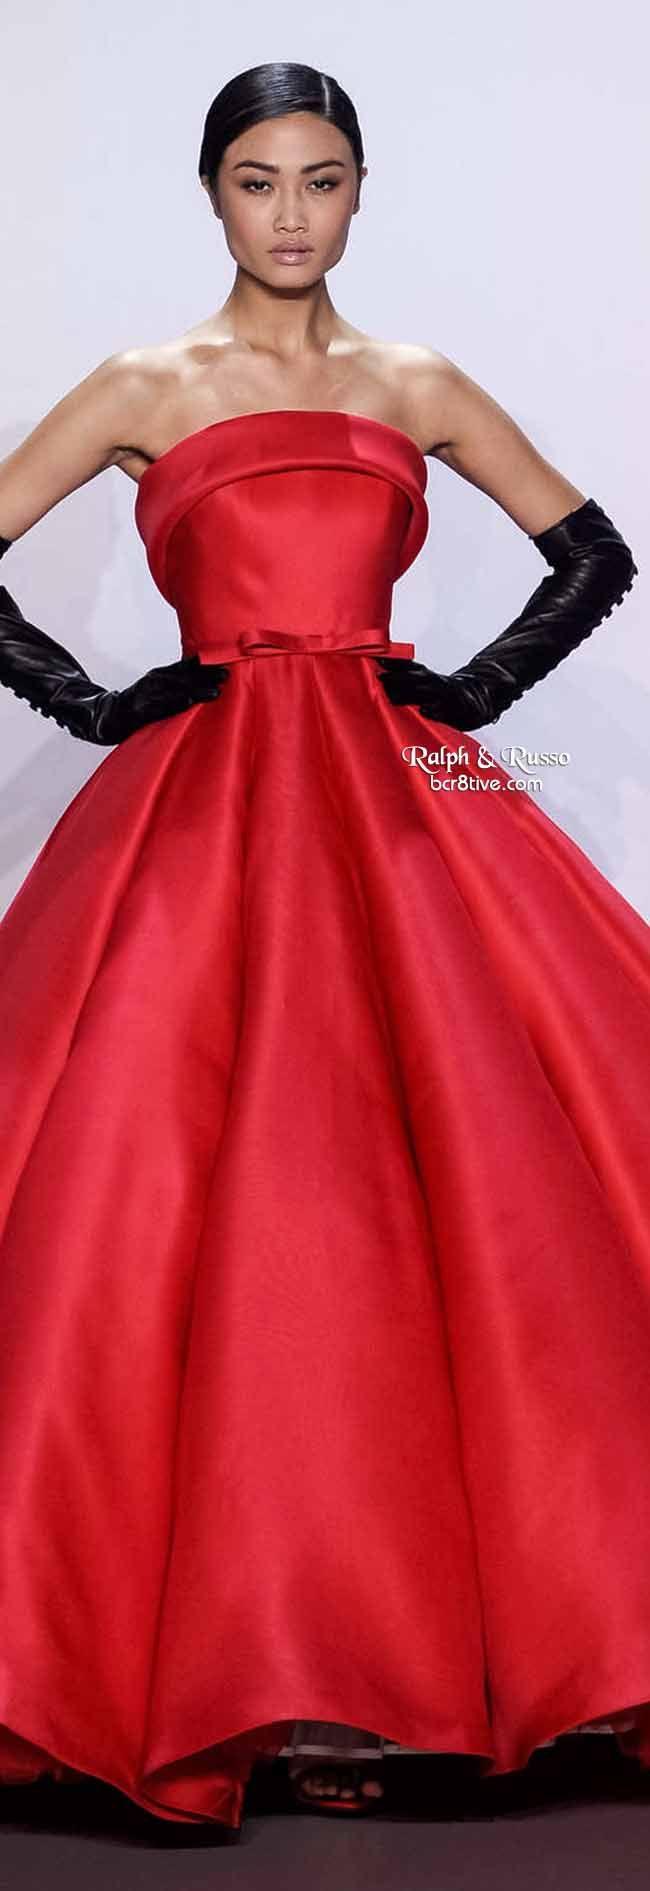 Ralph & Russo Spring 2014 HC | Raspberry red silk strapless gazar ballgown with soft roll collar and bow belt | High fashion